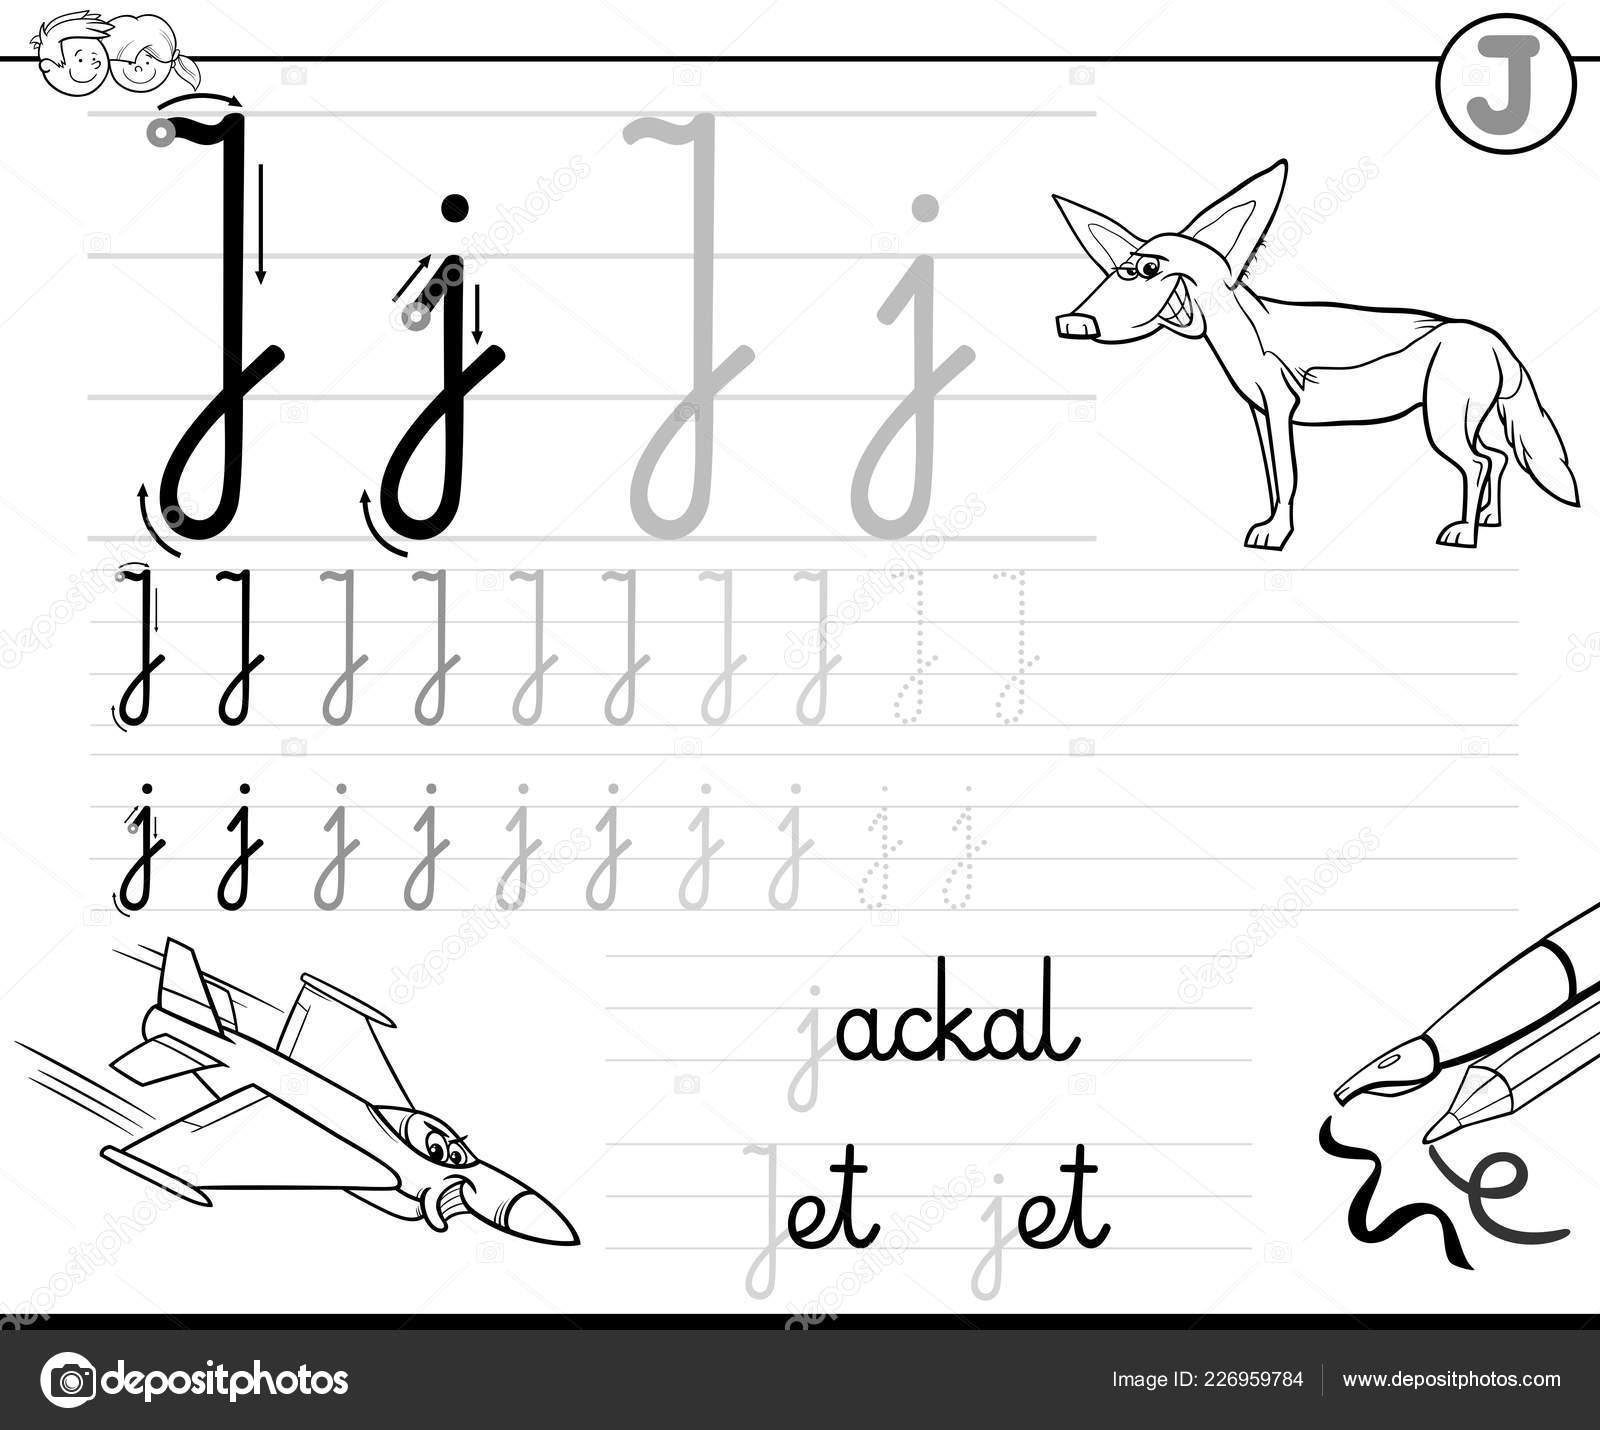 Black White Cartoon Illustration Writing Skills Practice Letter